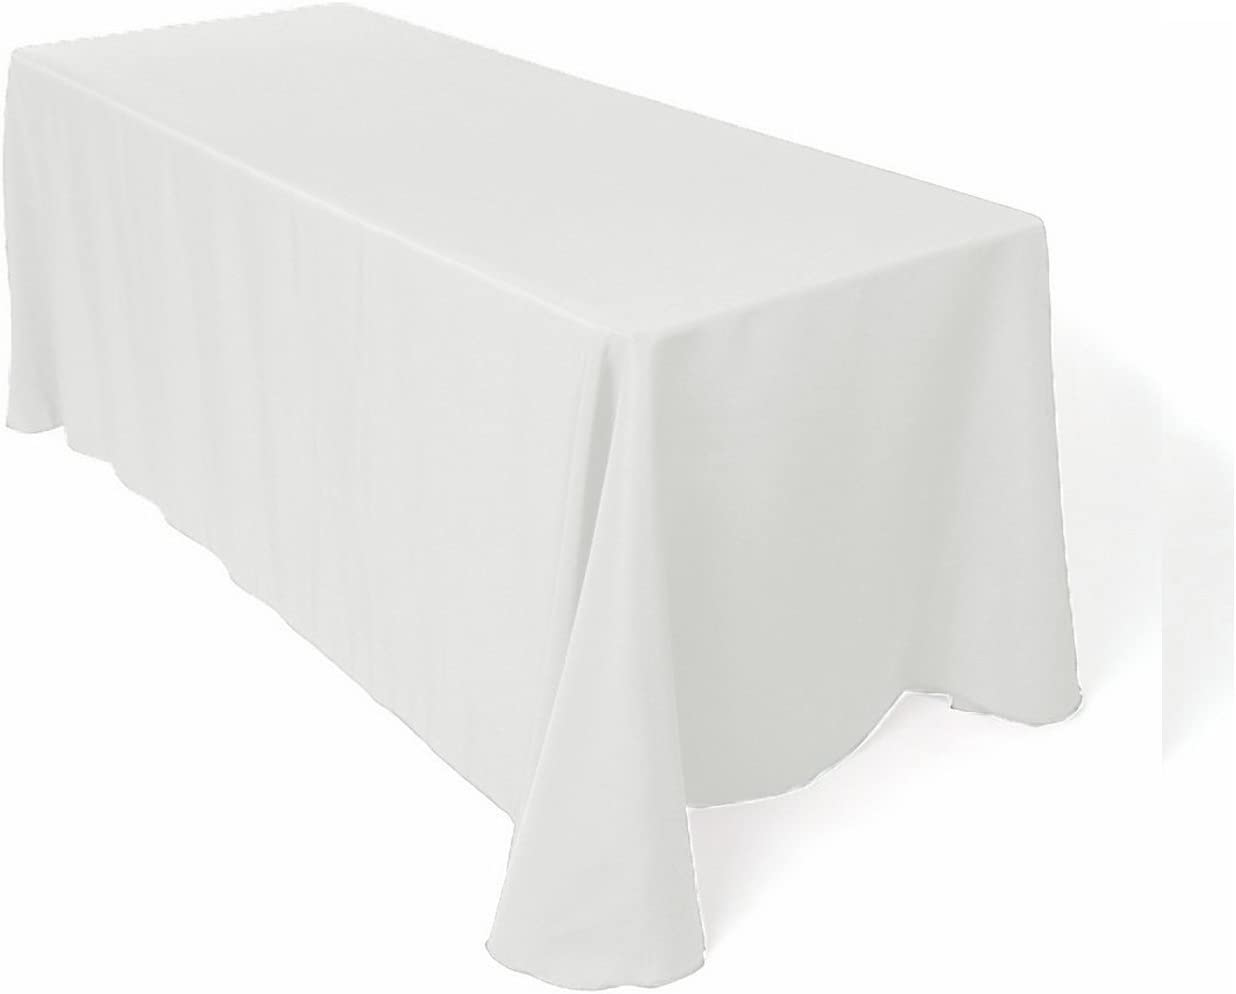 Polyester Rectangular Tablecloth 90